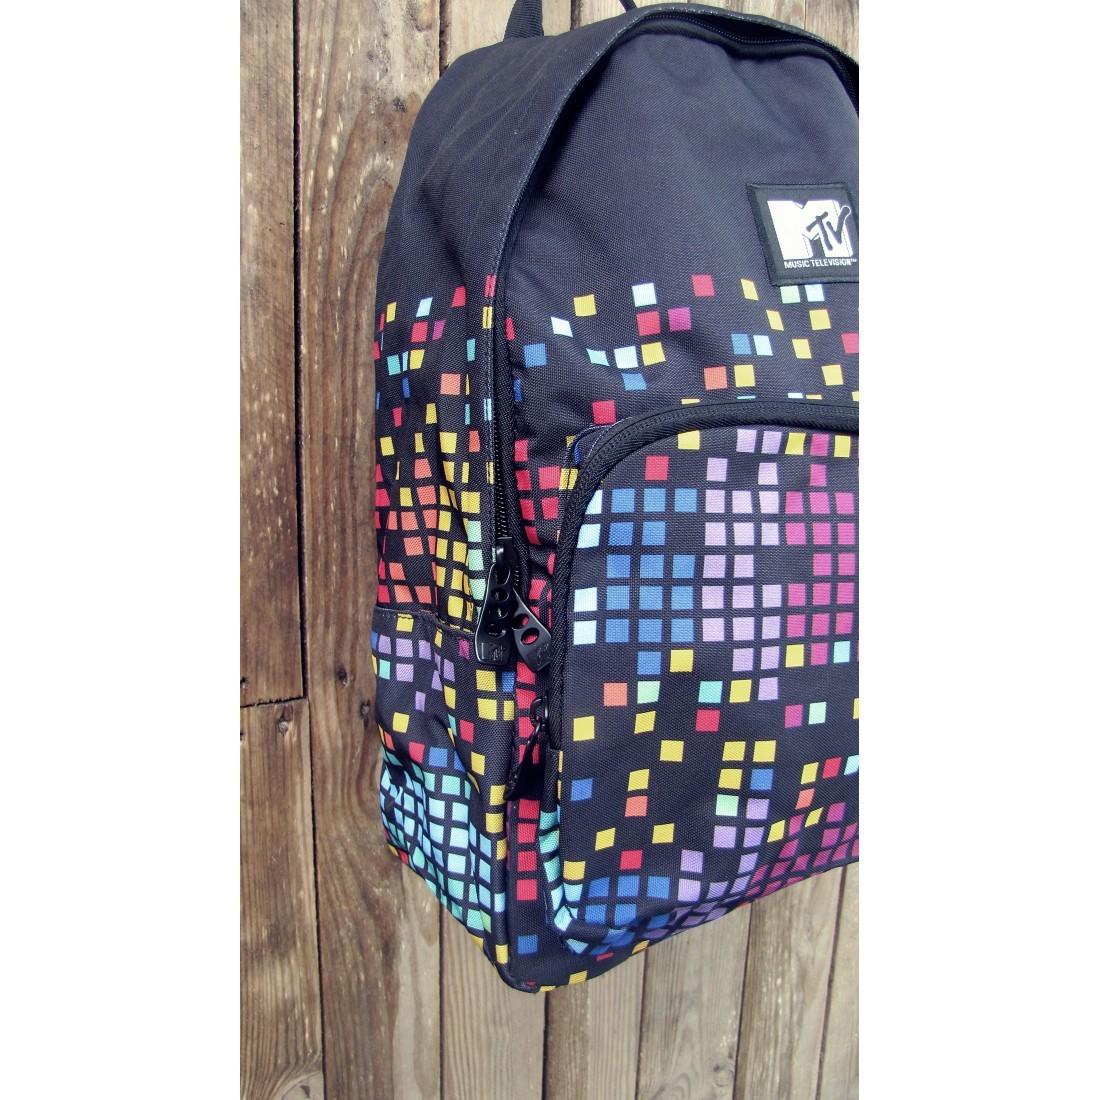 Plecak młodzieżowy Coolpack MTV Equalizer - plecak-tornister.pl